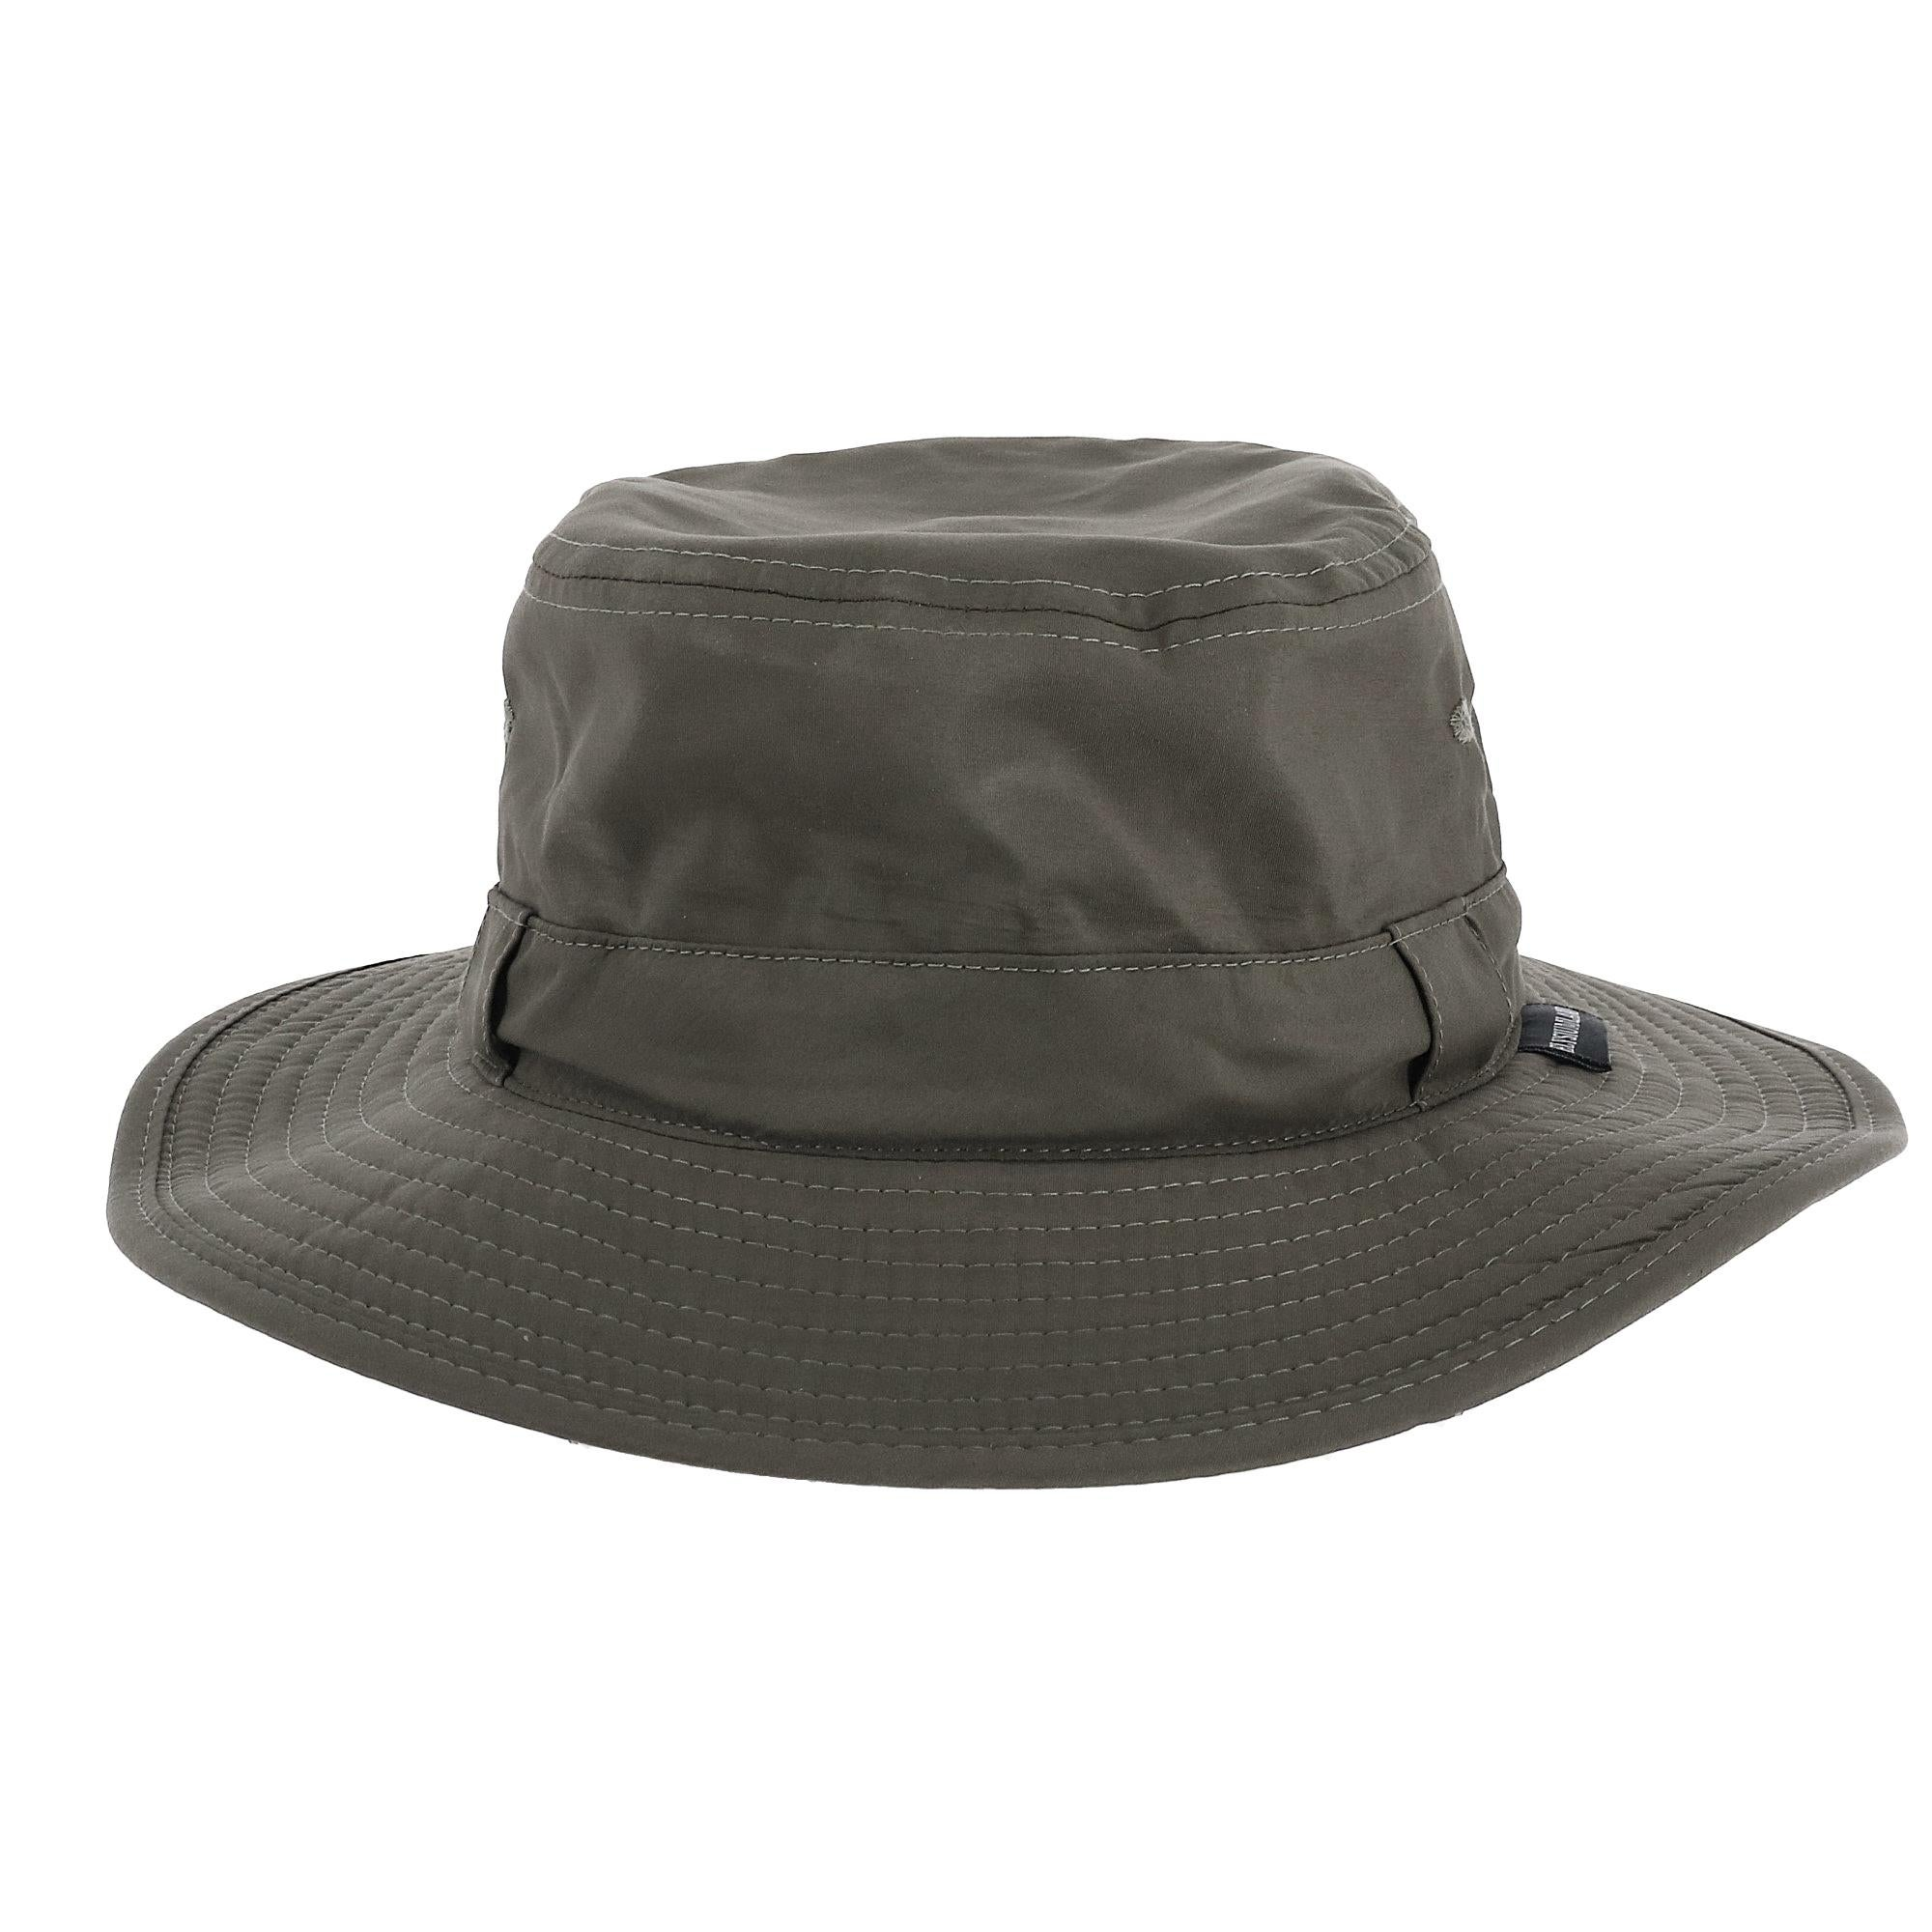 0345f10ebea8a Buy Wide Brim Men s Hats Online at Overstock